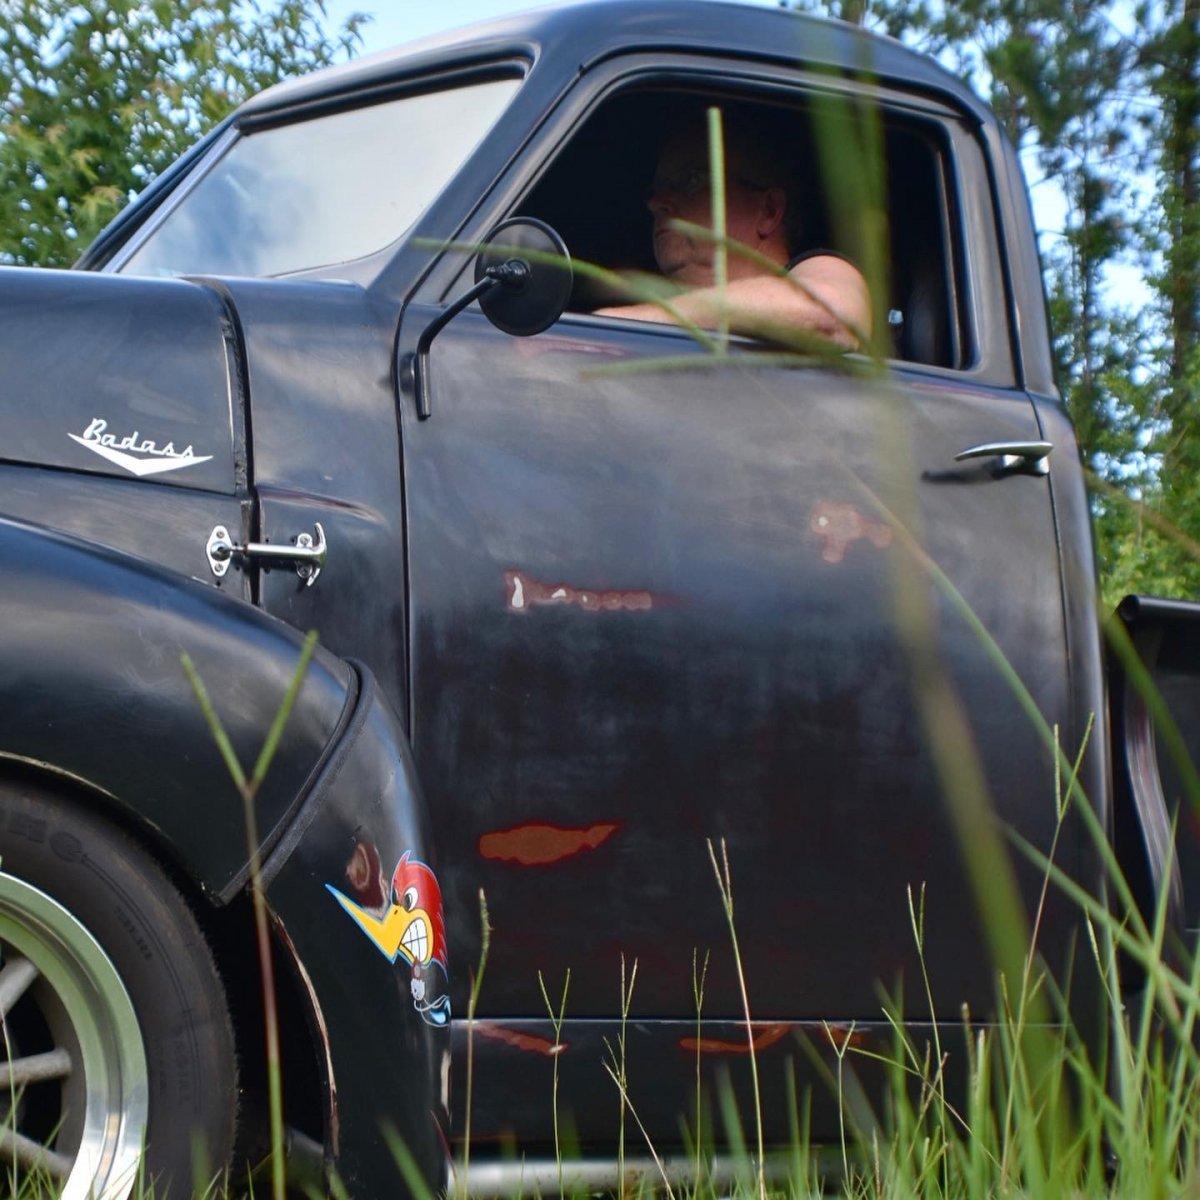 CC driver truck pic.jpeg